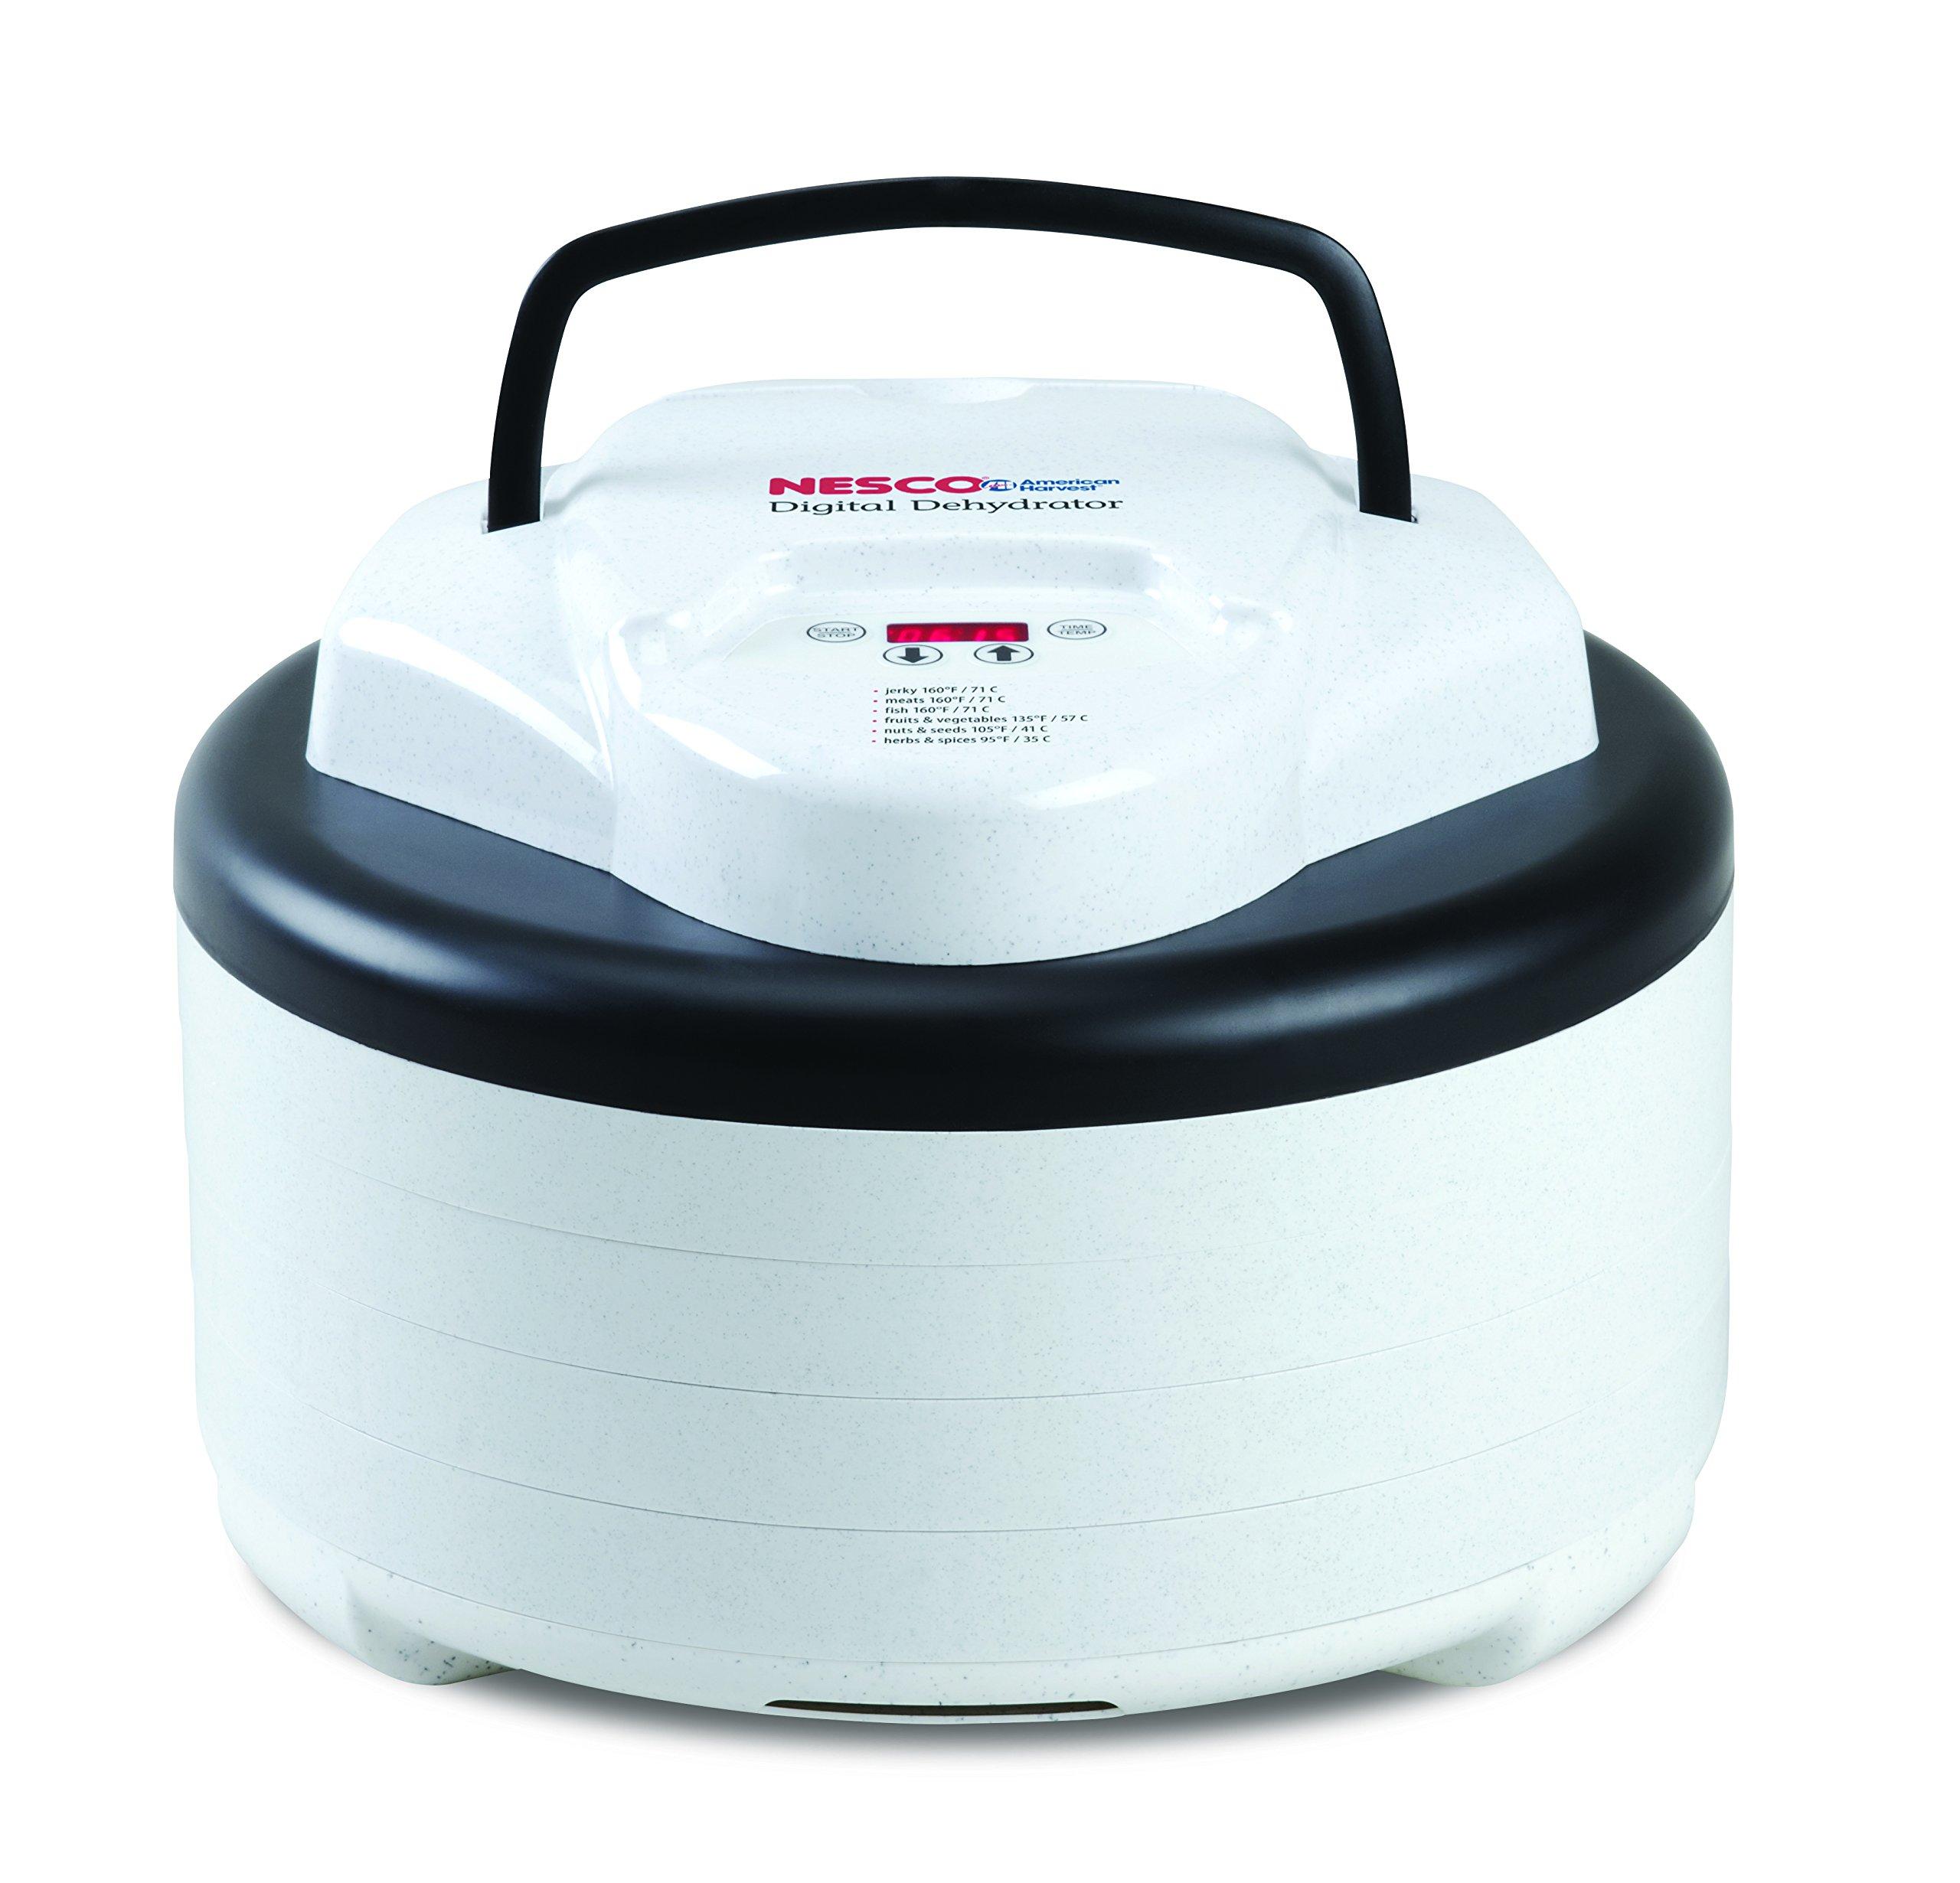 Nesco FD-77DT Digital Food Dehydrator, White - MADE IN USA